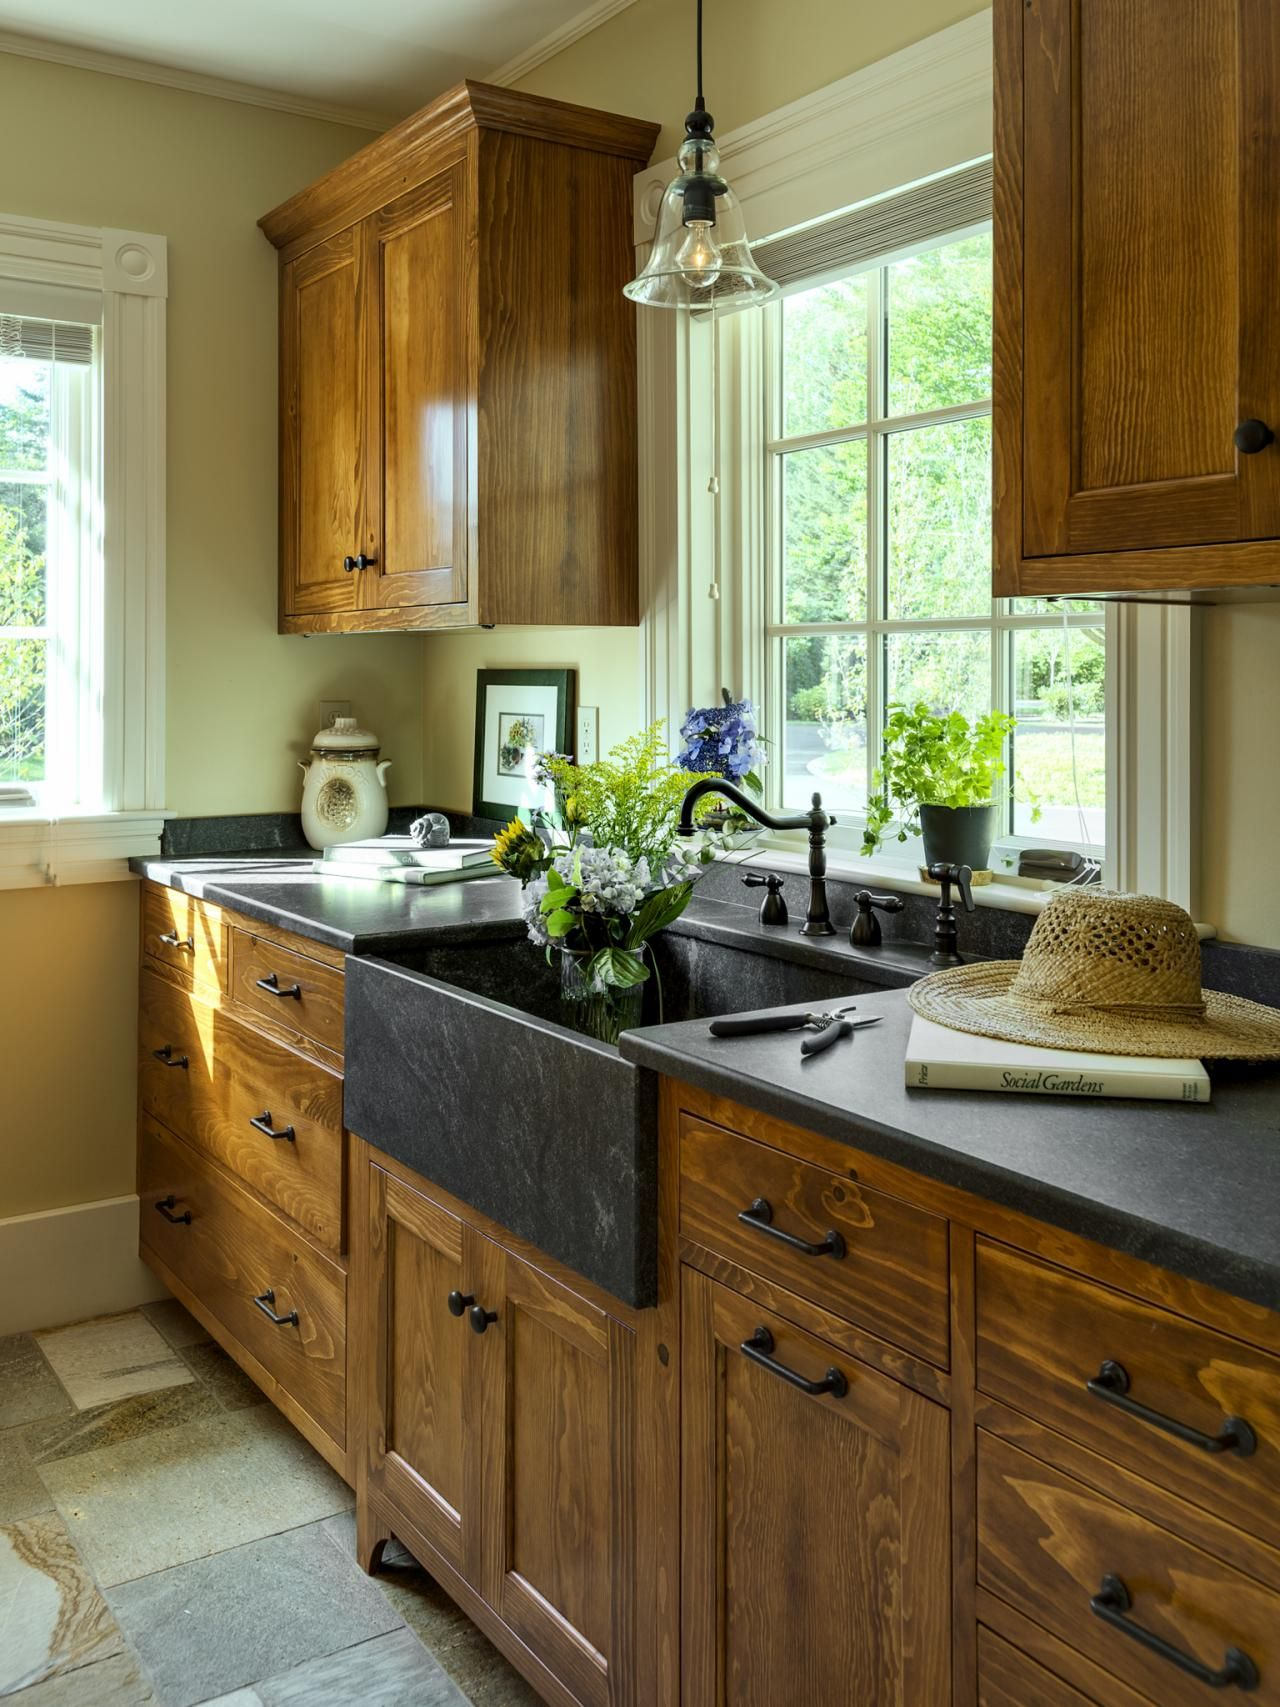 best of hgtv com in 2014 cottage style kitchen kitchen cabinet design rustic kitchen cabinets on kitchen cabinets rustic farmhouse style id=66884